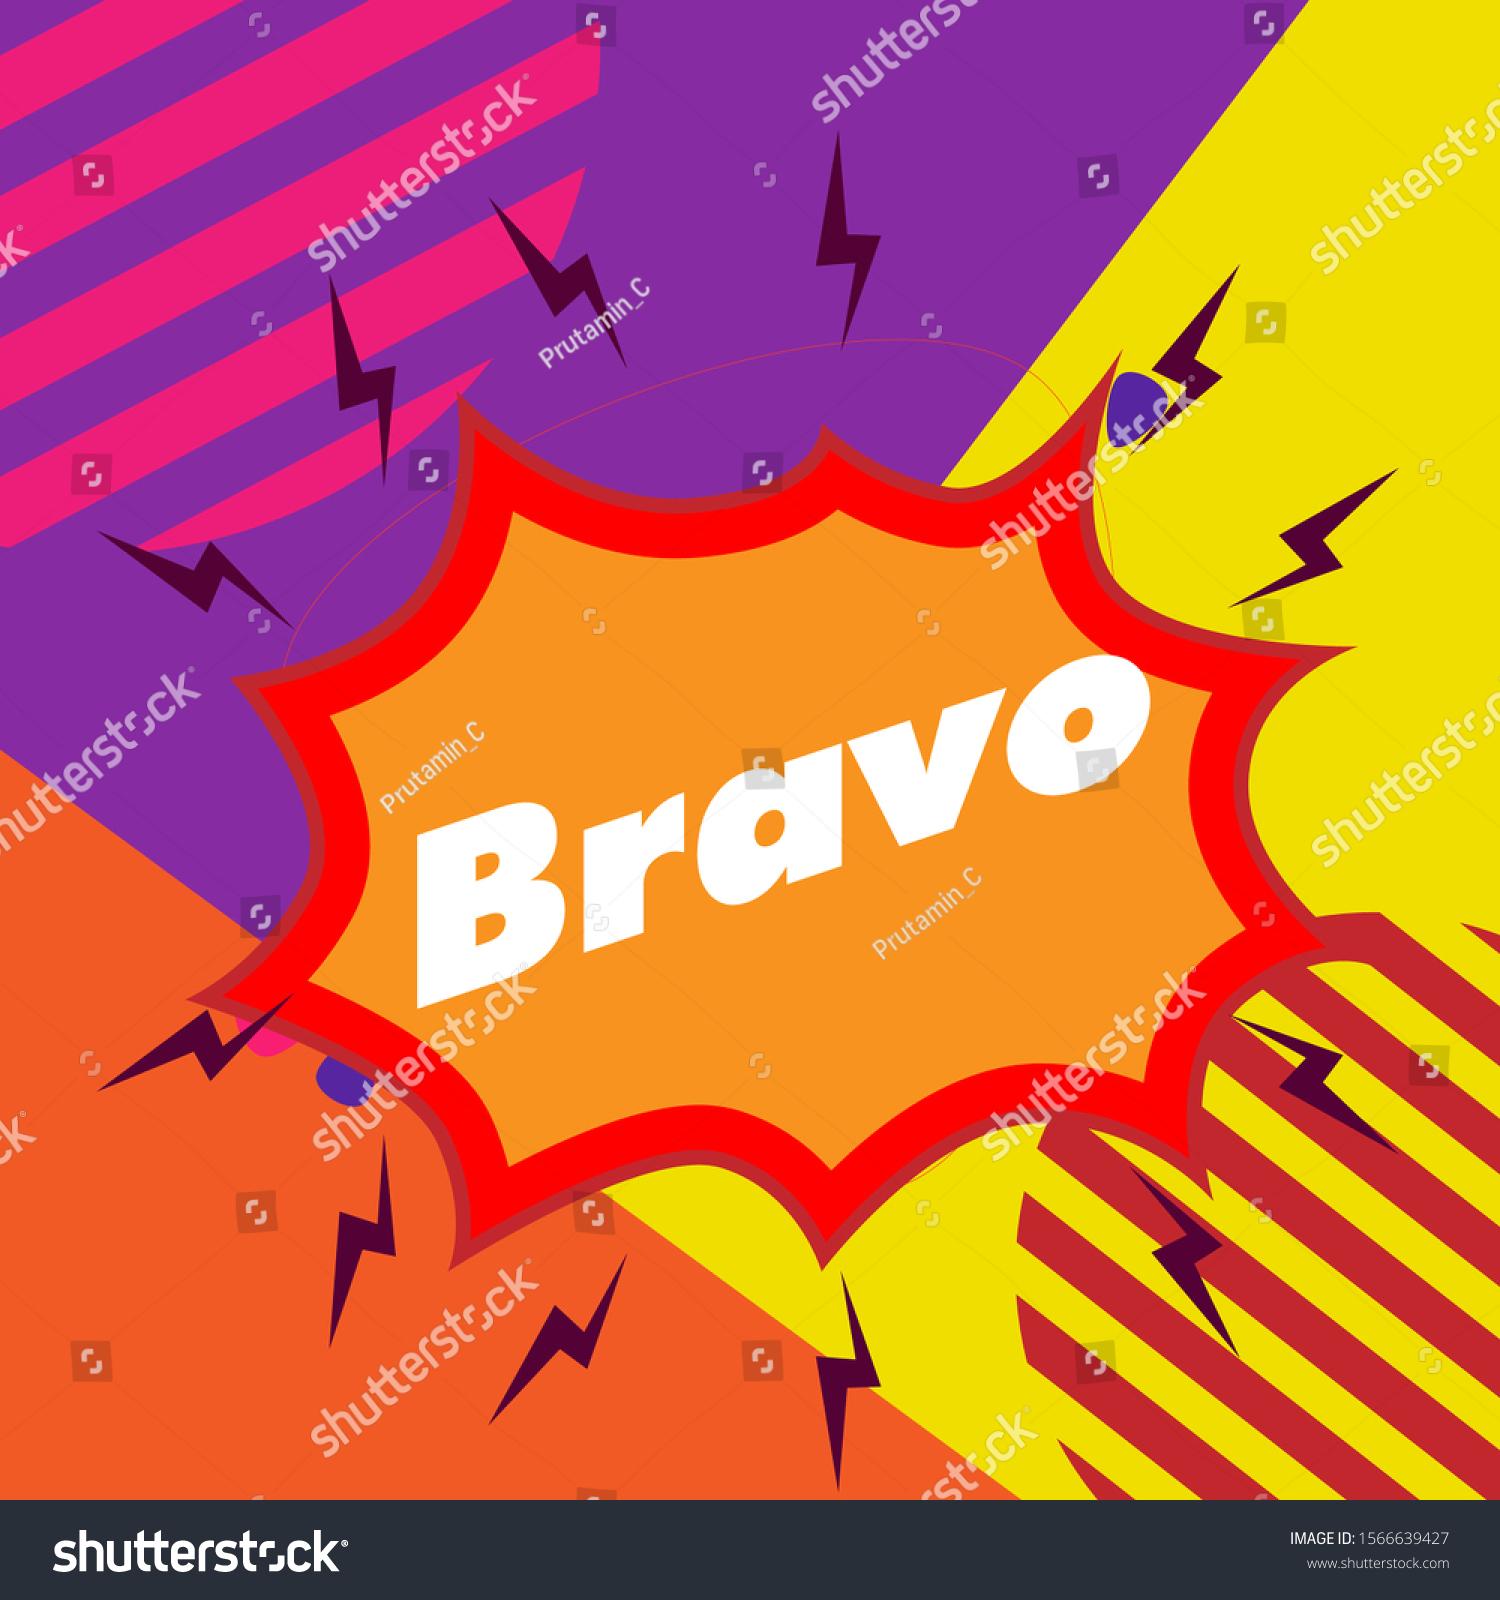 stock-vector-bravo-beautiful-greeting-ca